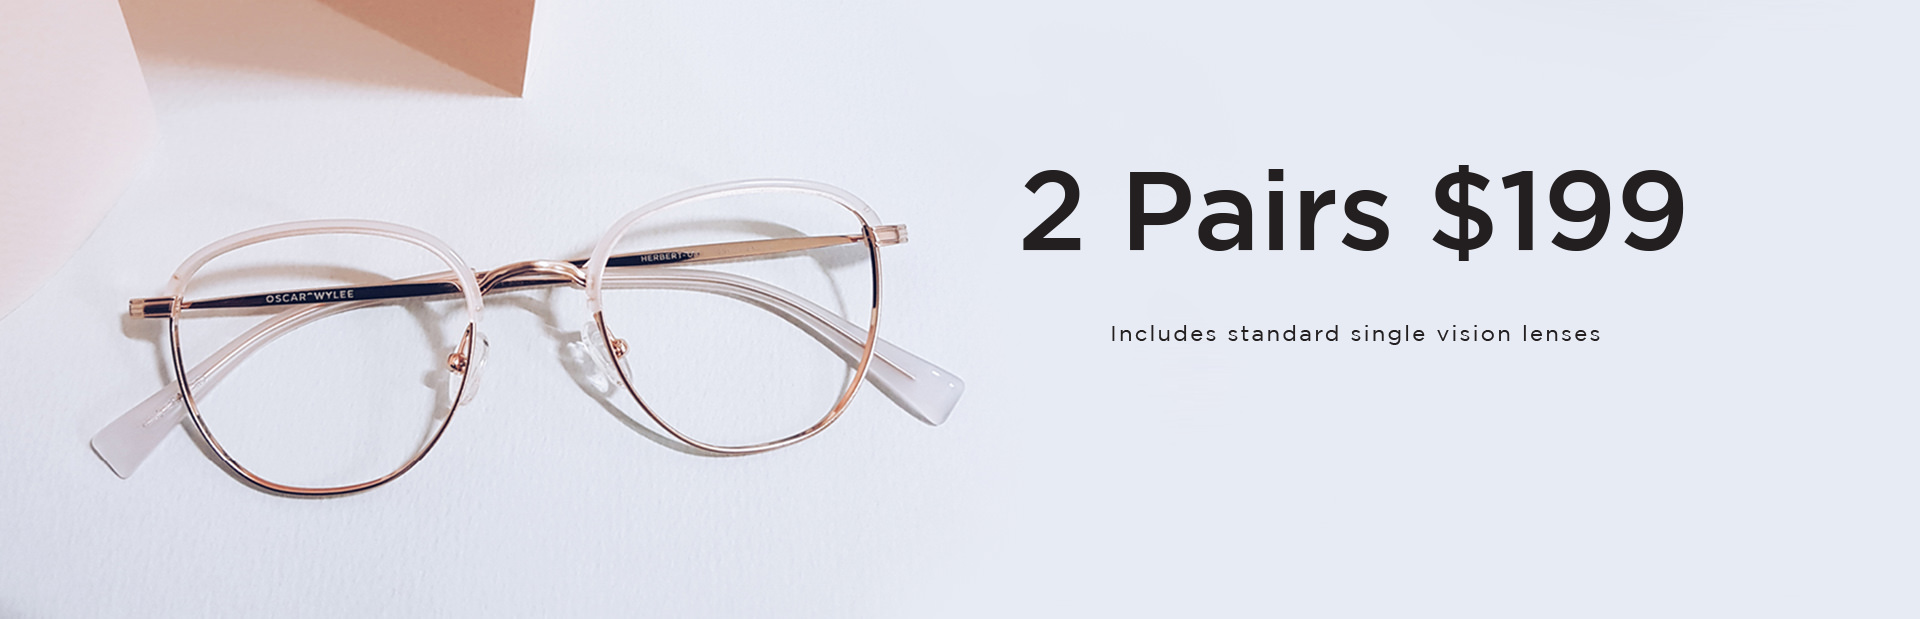 fa927e574546 Oscar Wylee  Online Eyeglasses   Sunglasses - Rx Glasses • Oscar Wylee